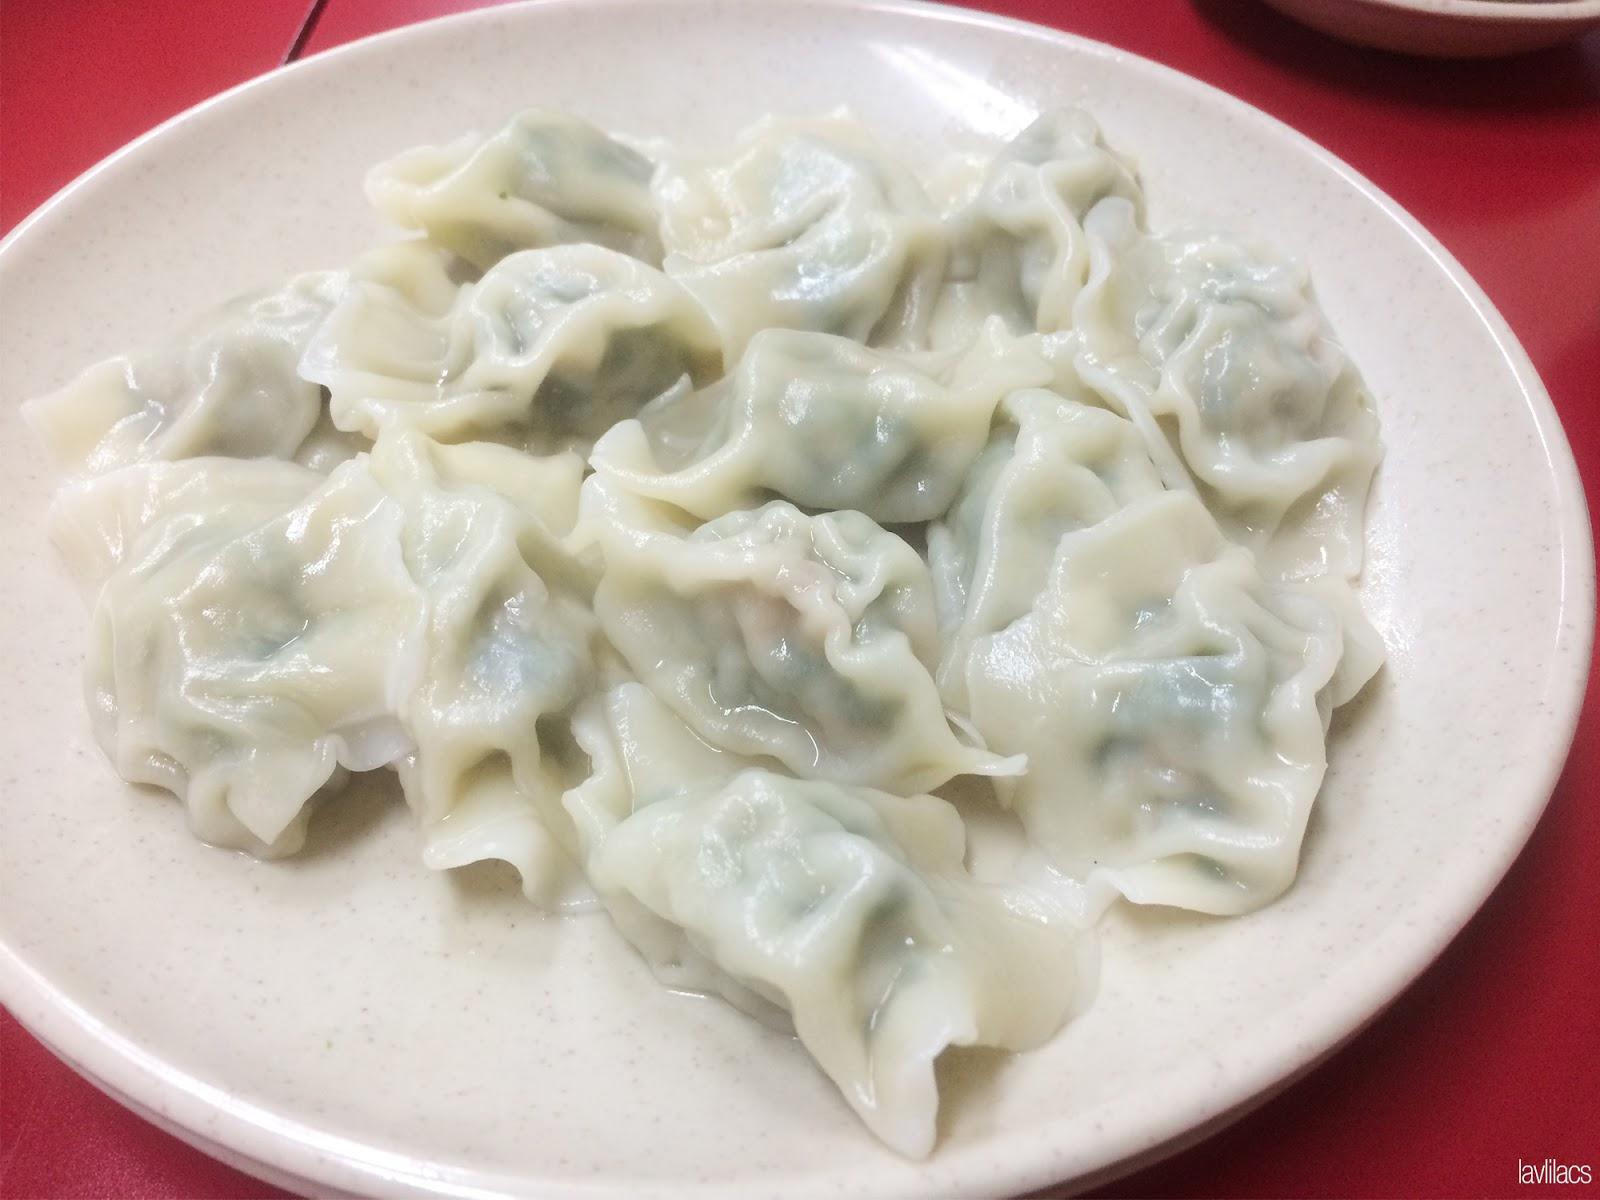 Seoul, Korea - Summer Study Abroad 2014 - Yeonhuidong 연희동- Five Spice Mandoo 五香만두 - Boiled dumplings Mool mandoo 물만두